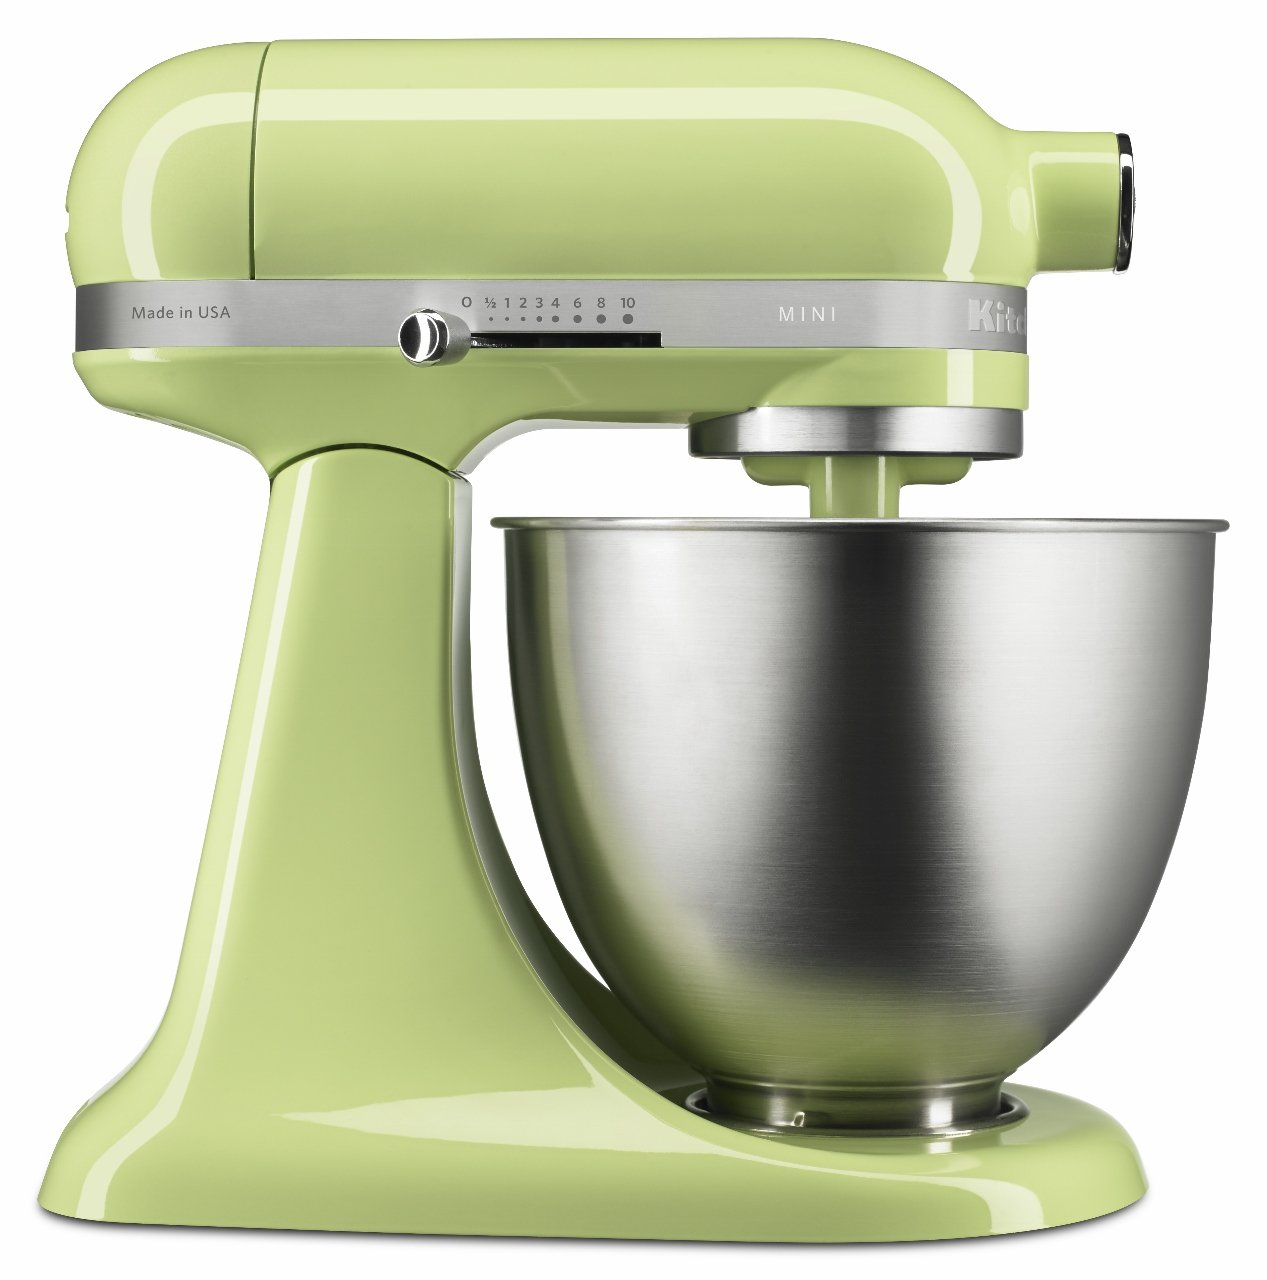 KitchenAid Artisan Mini 5KSM3311XBHW 3.3 Litre Stand Mixer (Honeydew)